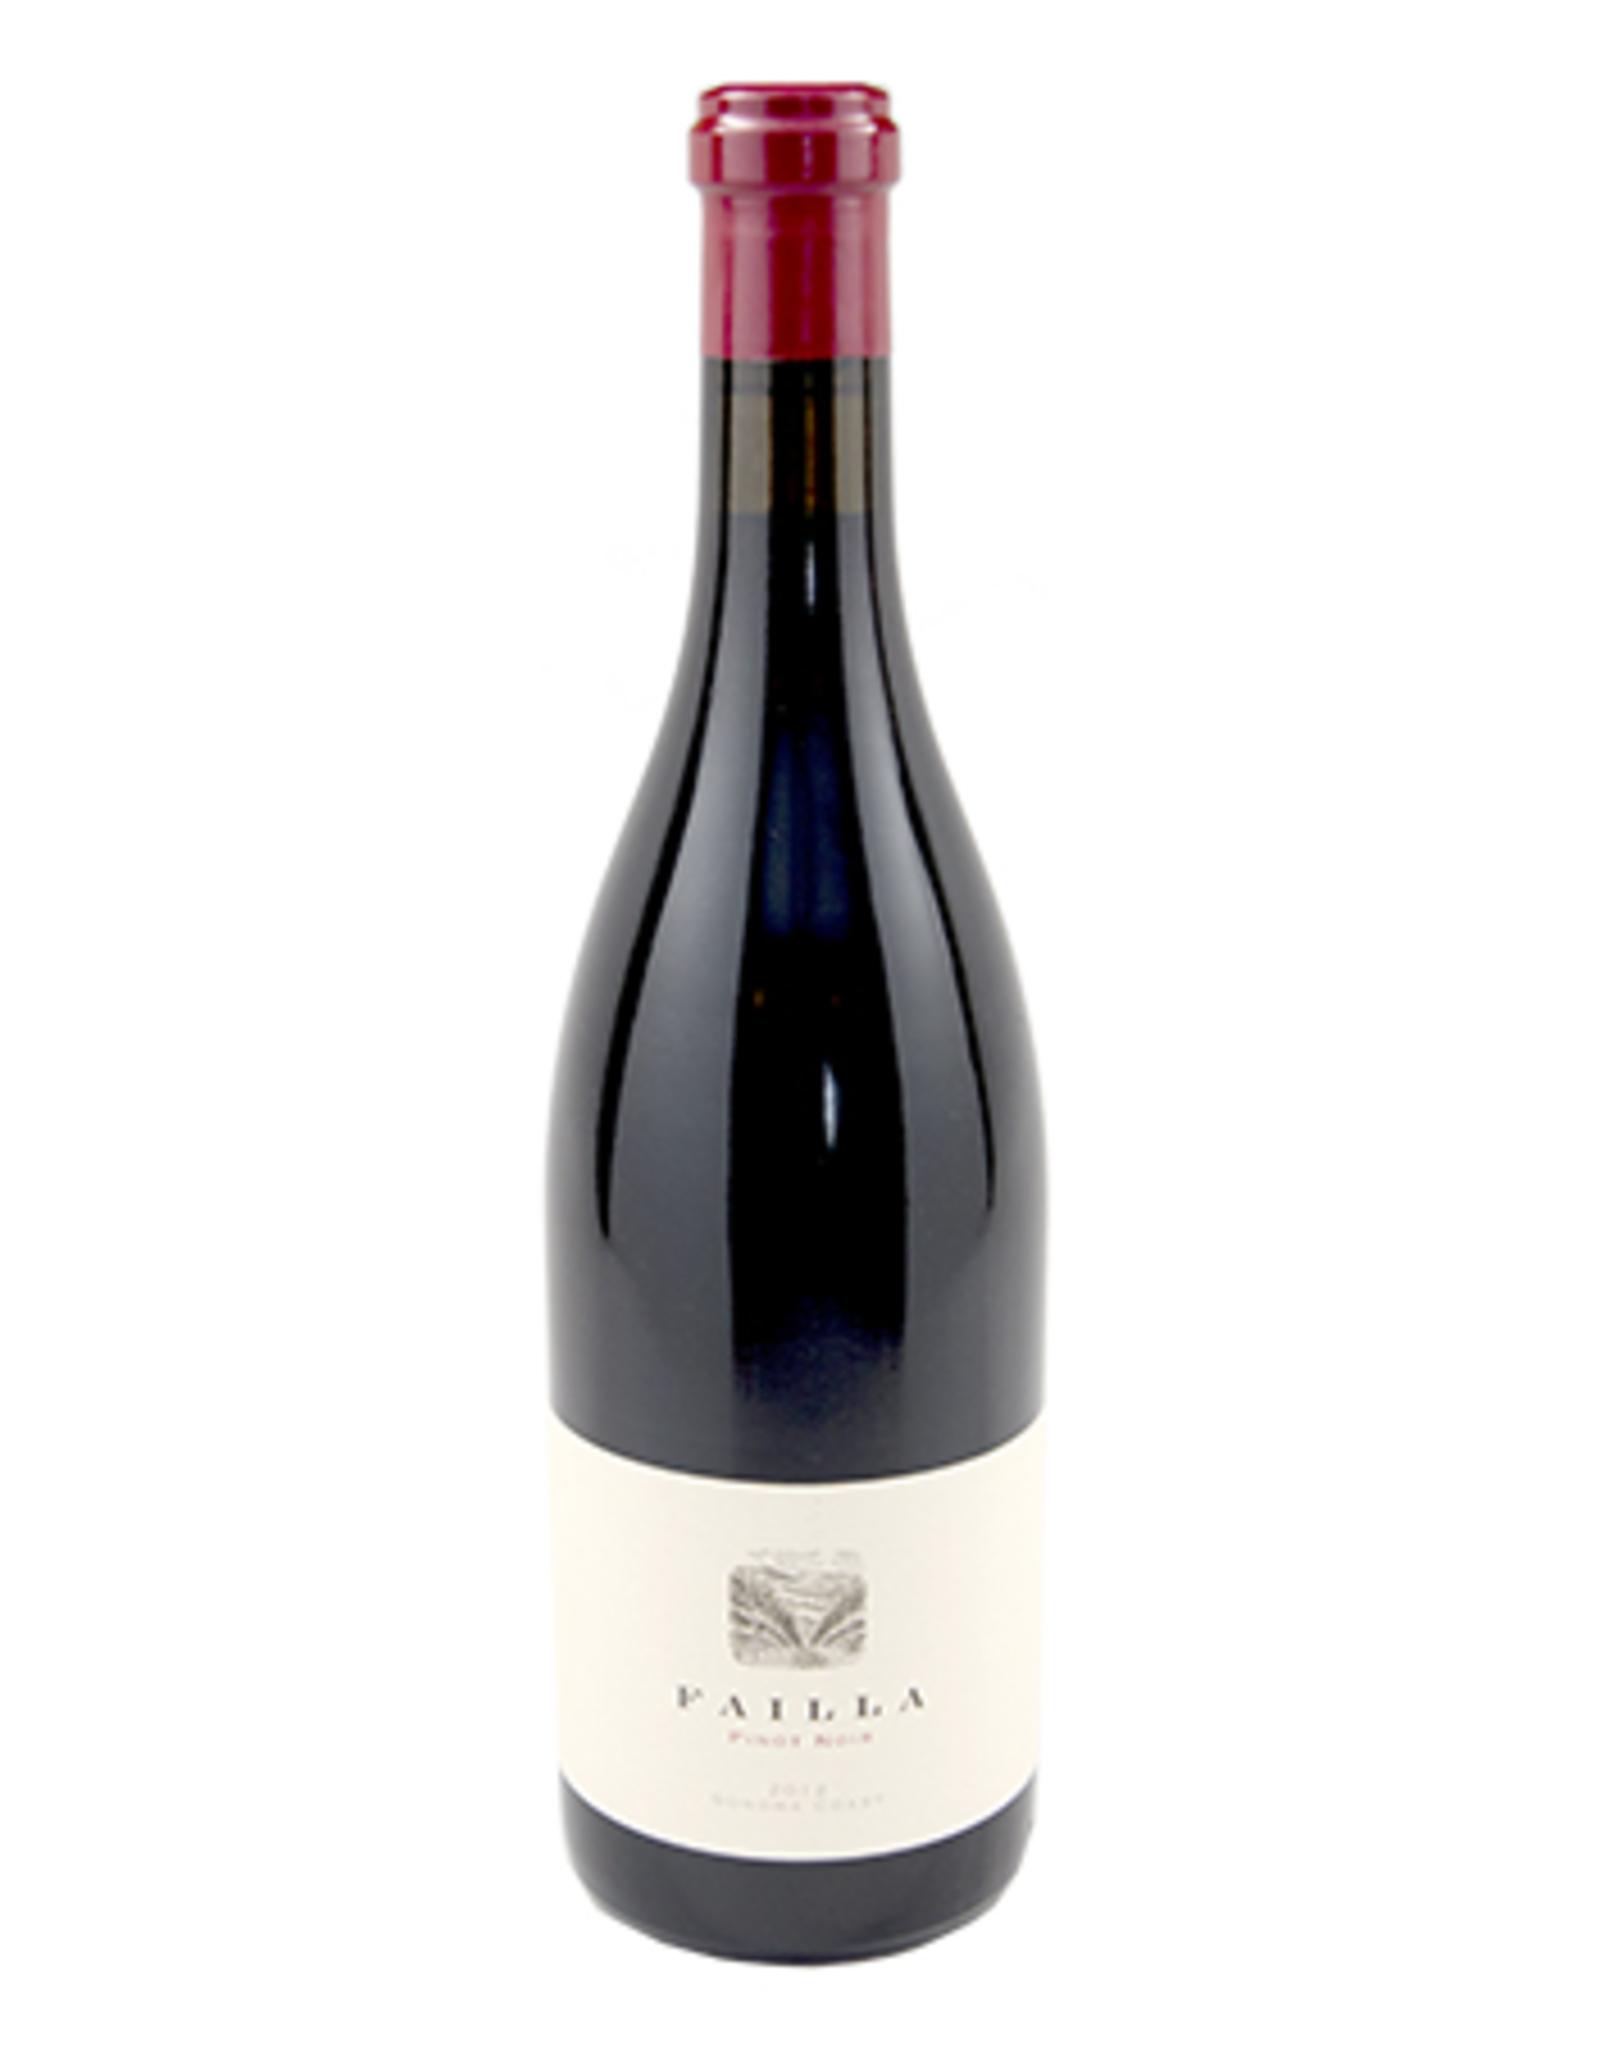 Failla Willamette Pinot Noir 2018